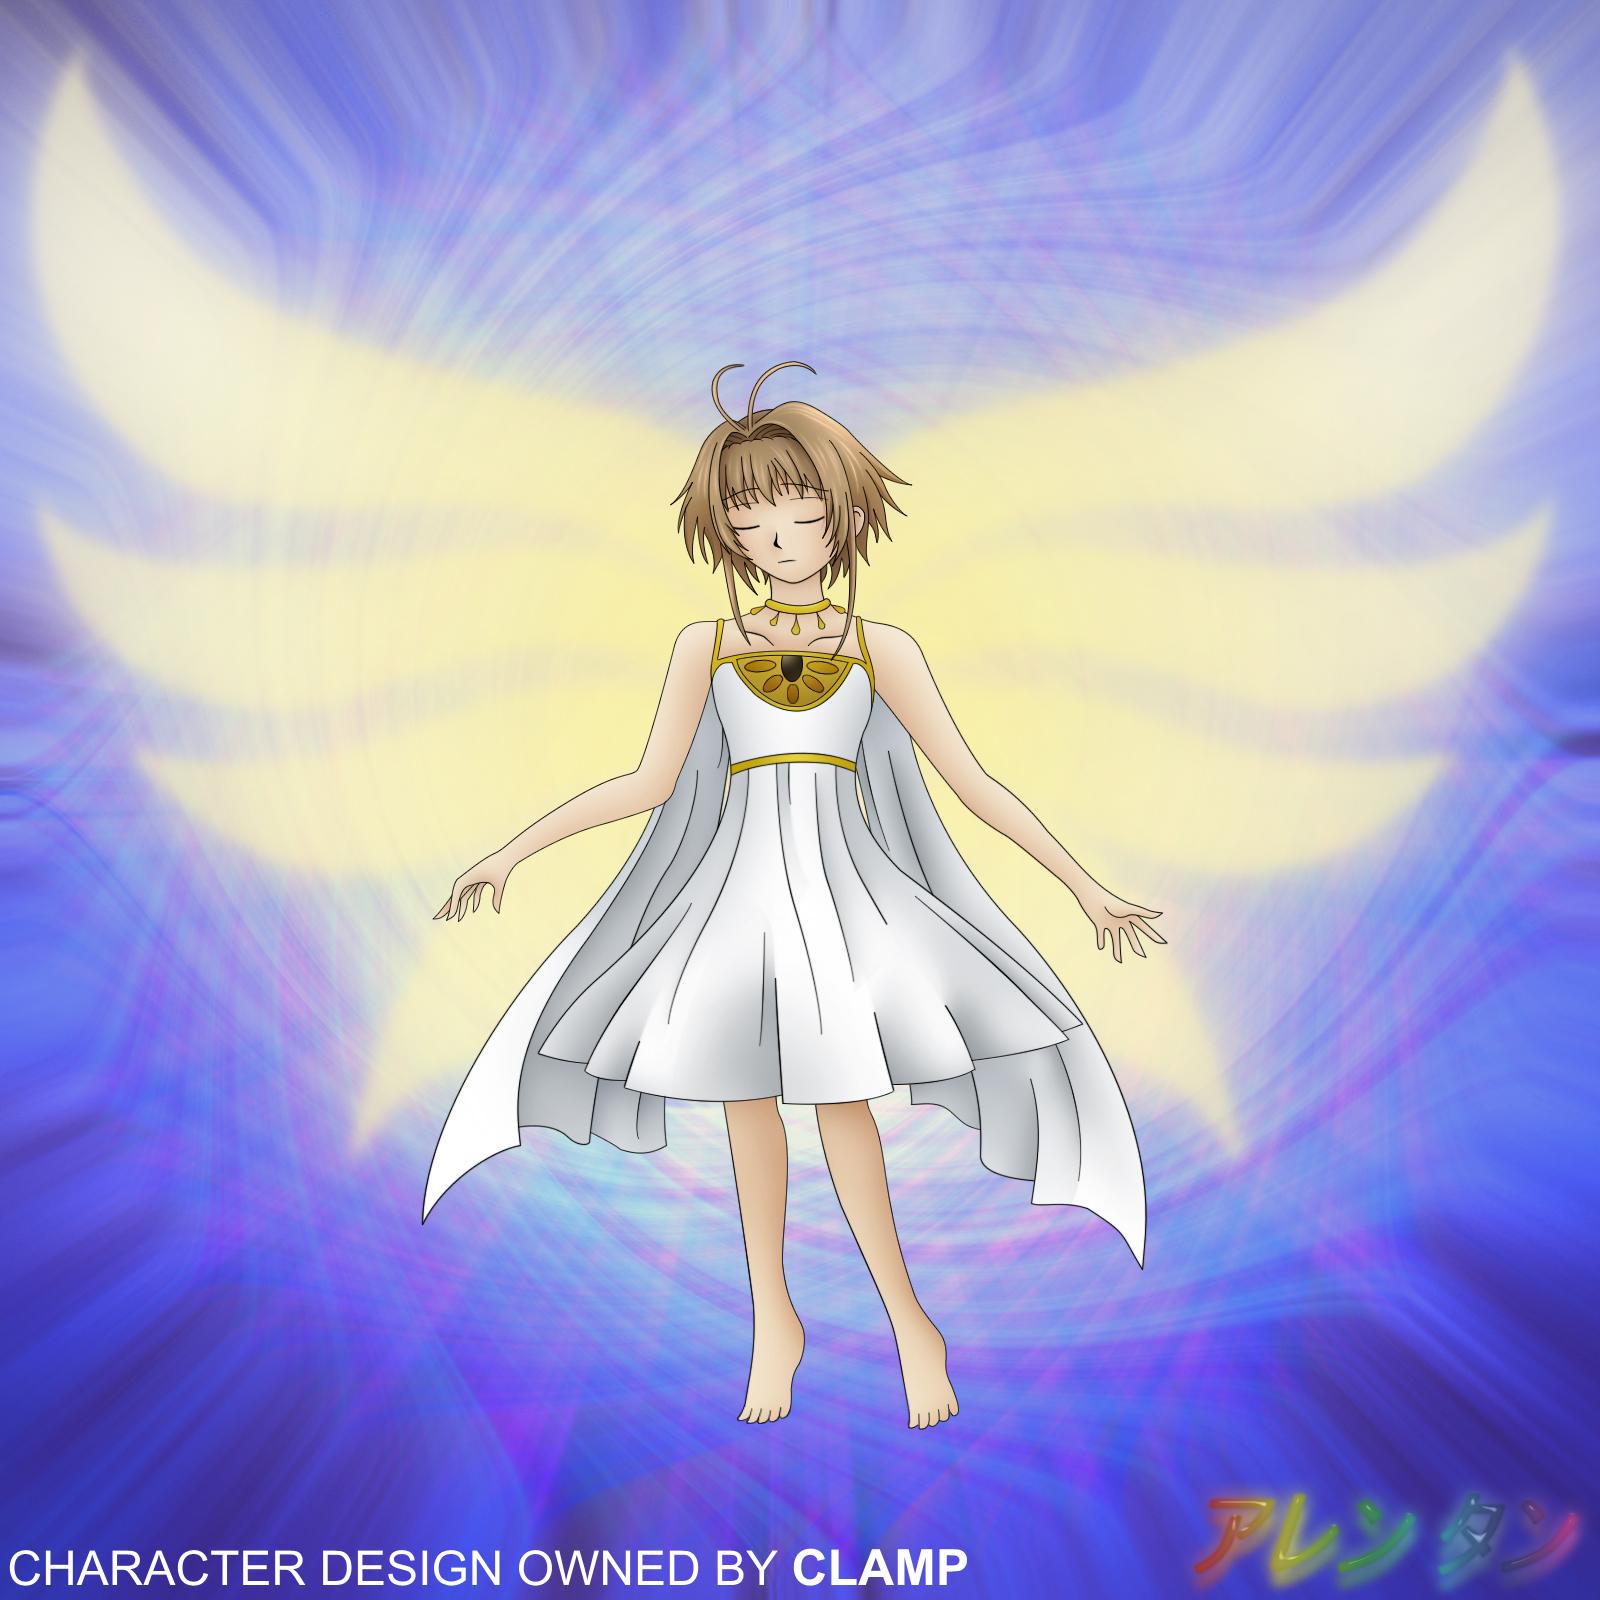 Princess Sakura 1586201: Princess Sakura By Humble-Novice On DeviantArt